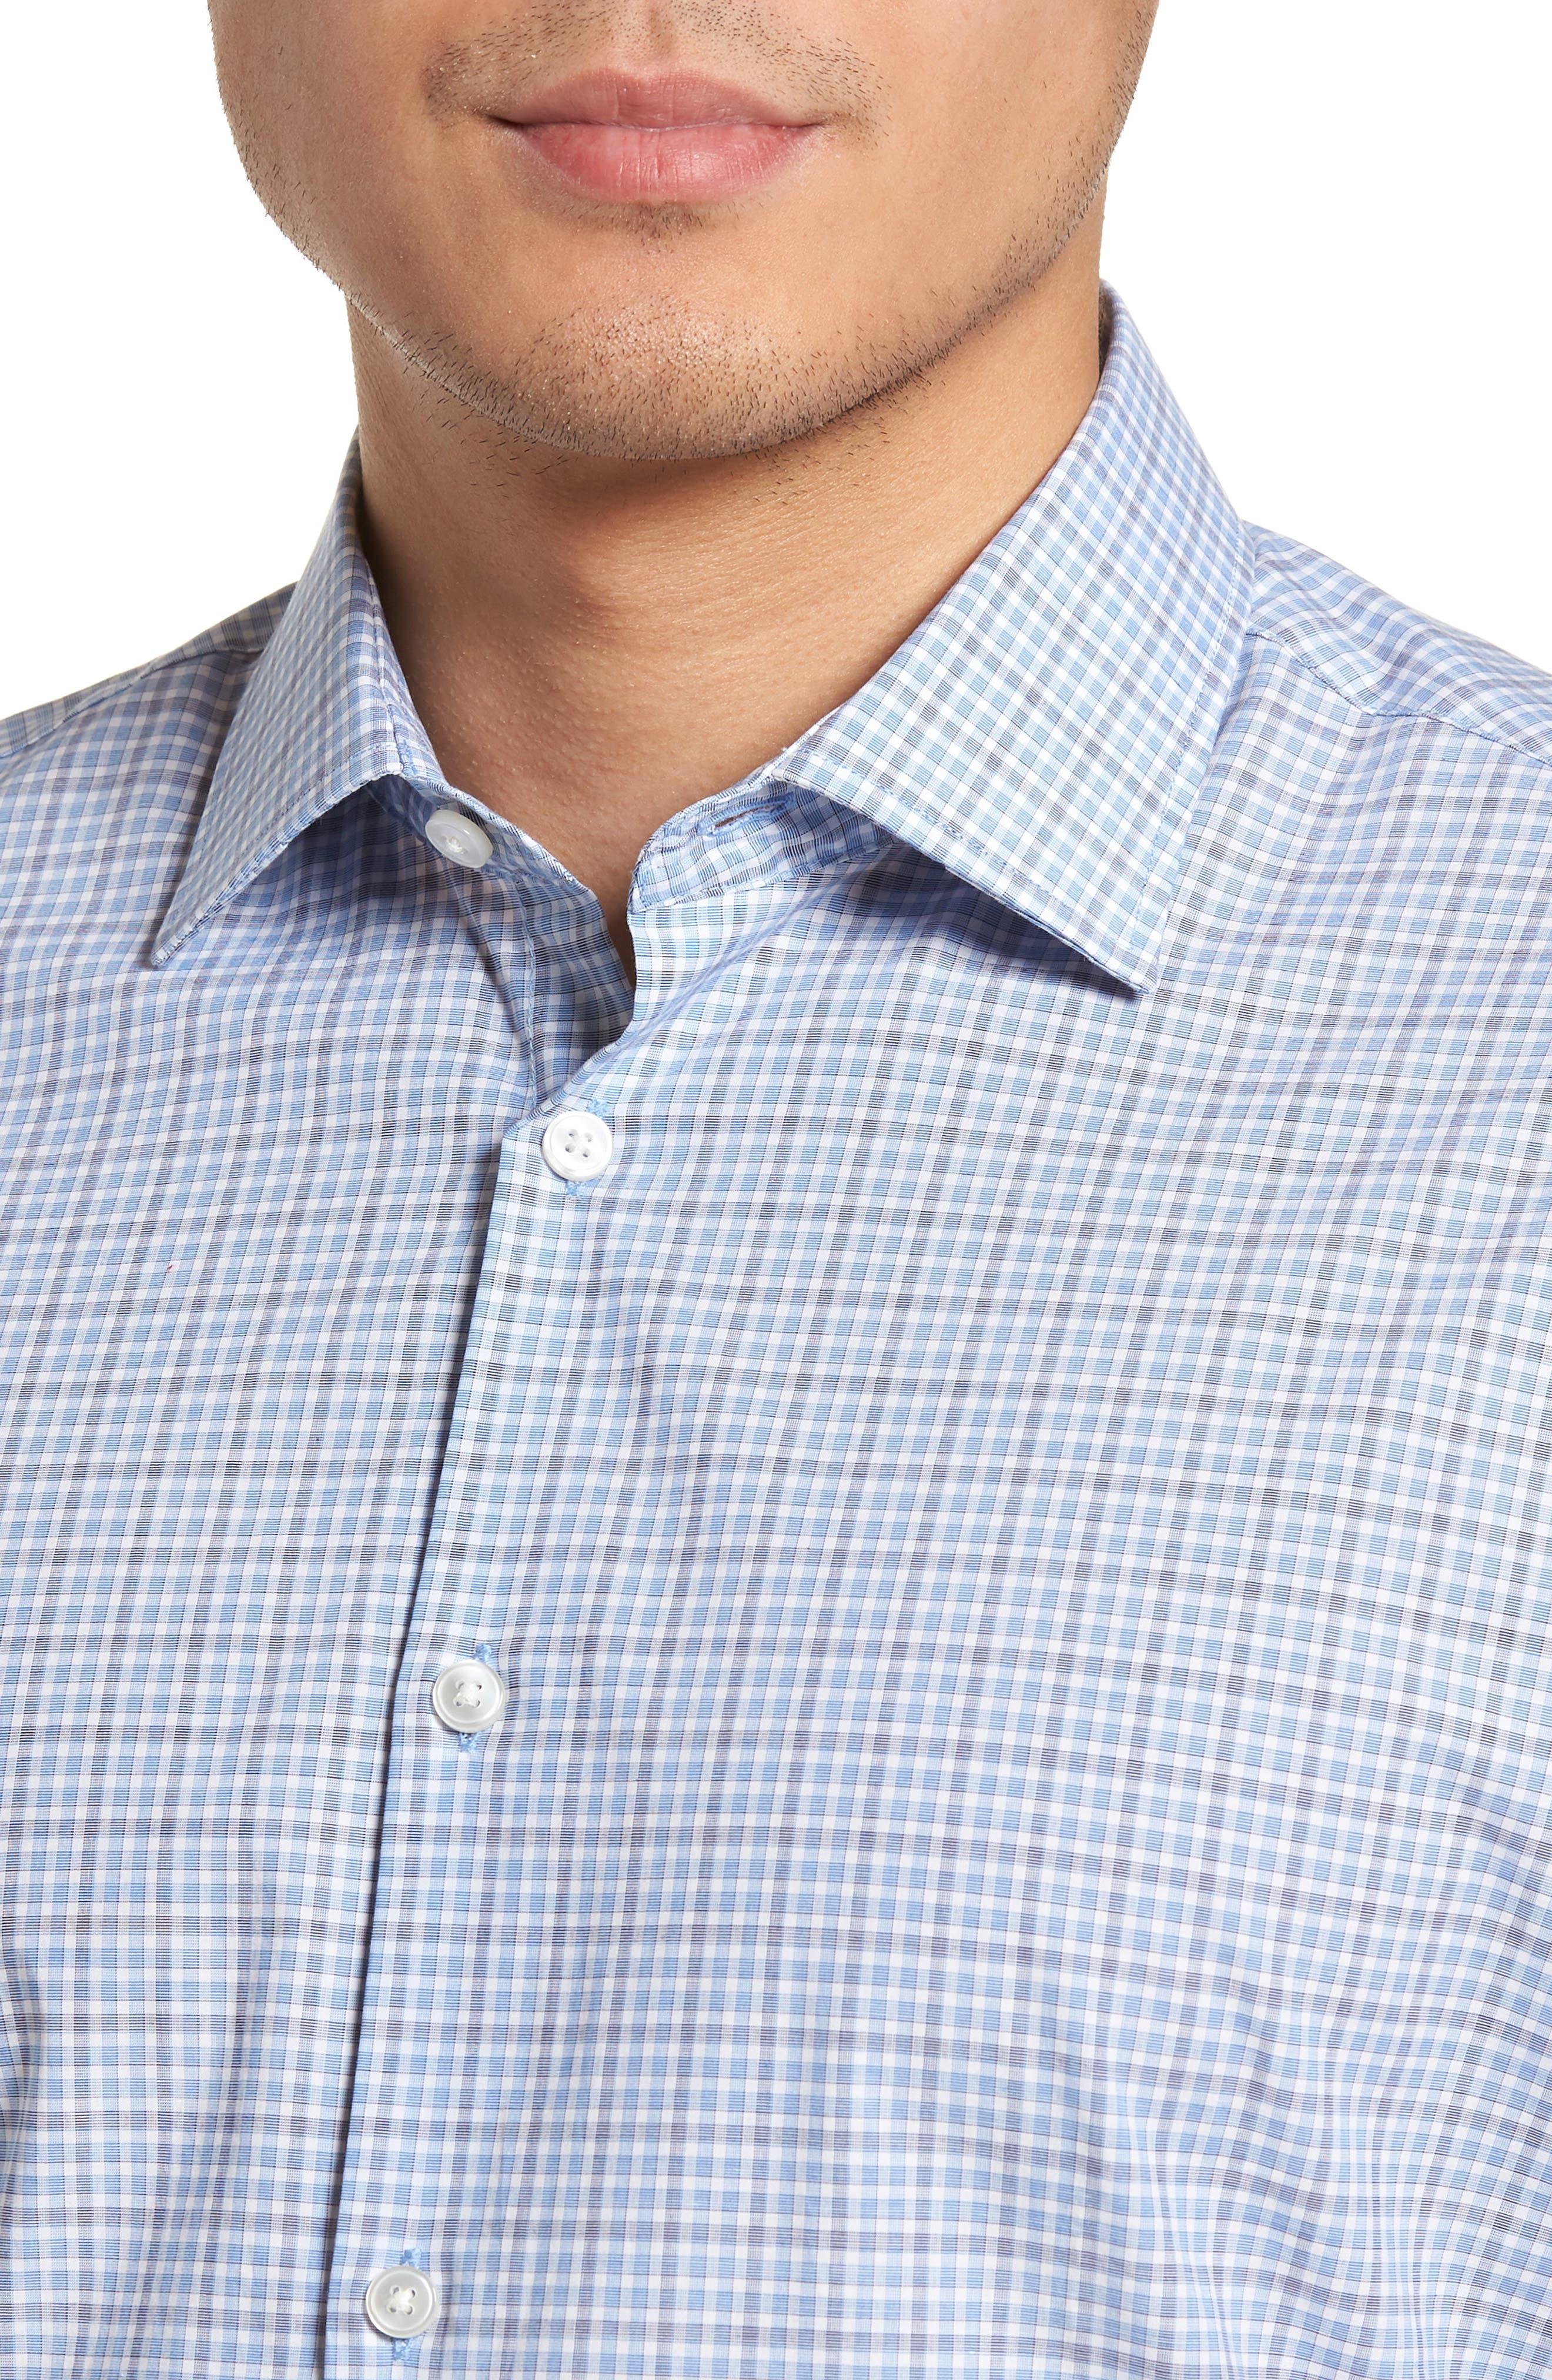 Regular Fit Stretch Check Dress Shirt,                             Alternate thumbnail 2, color,                             SKY